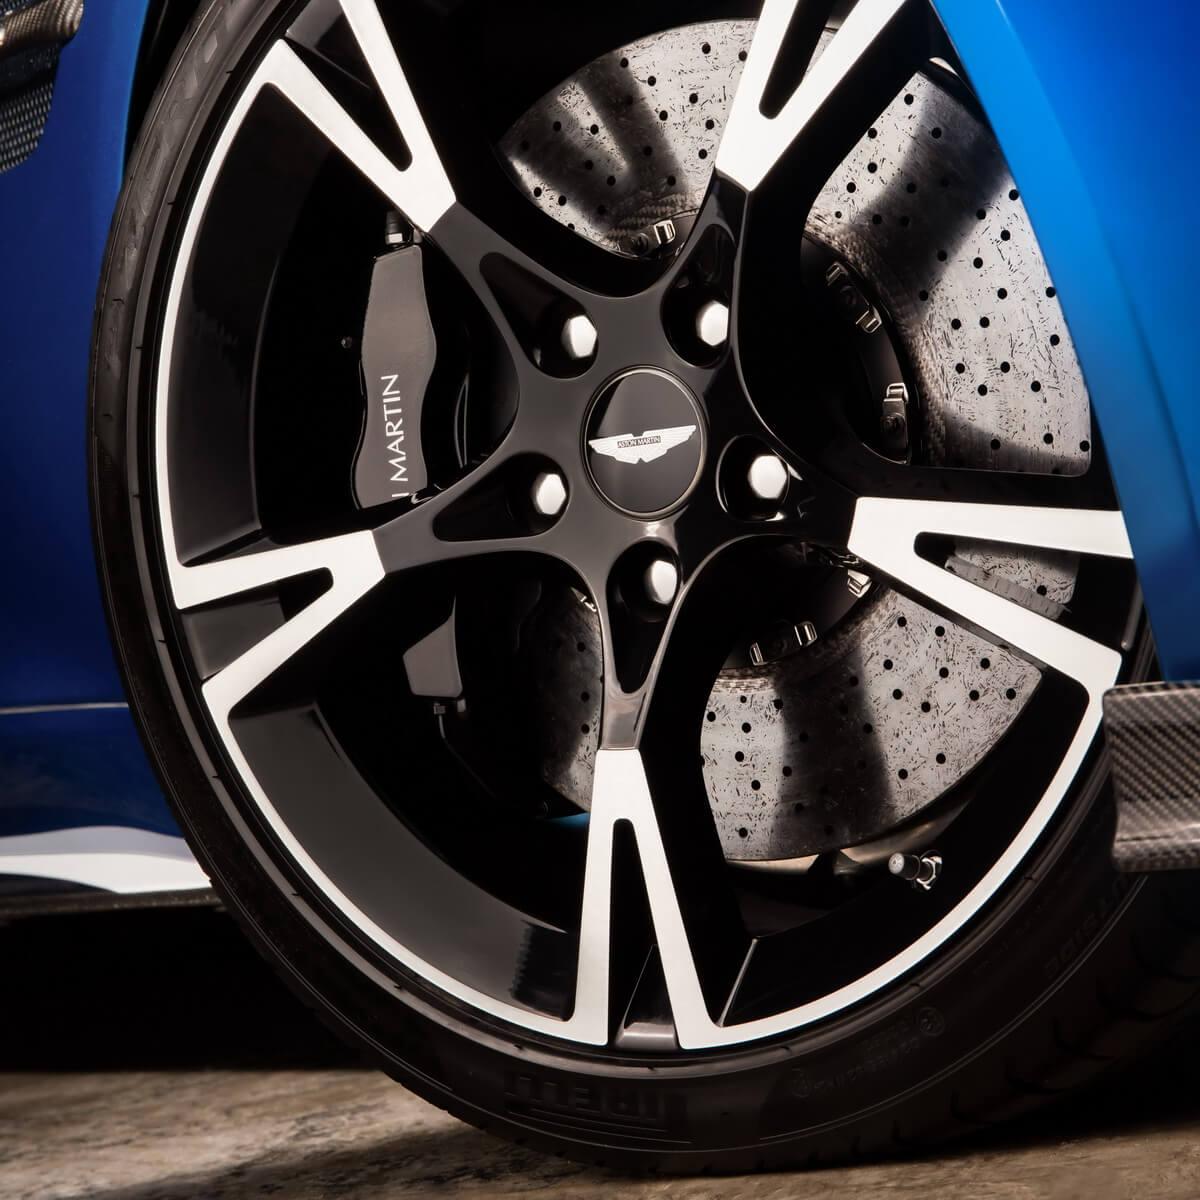 2016 Aston Martin Vanquish Camshaft: Aston Martin Vanquish S